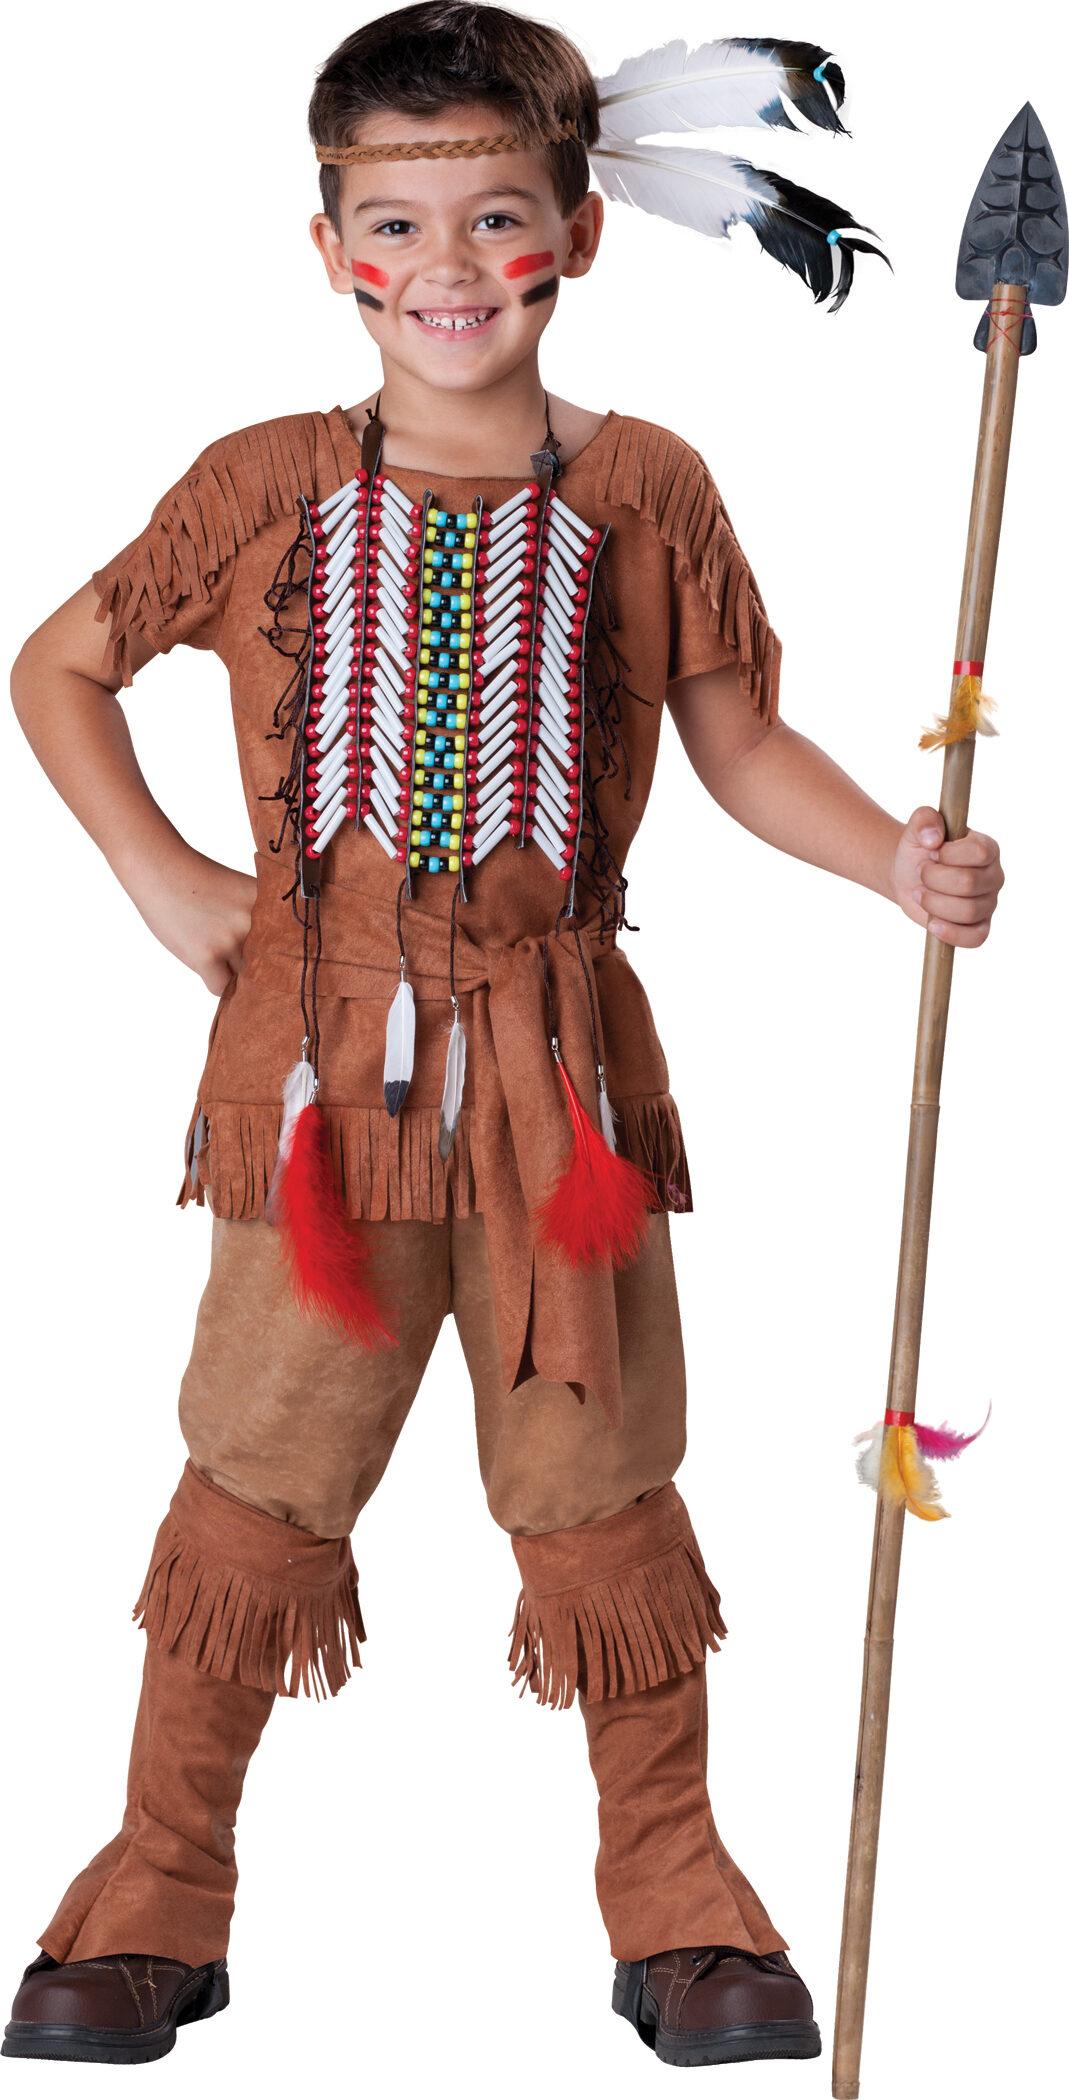 Elite Boys Indian Brave Kids Costume Mr Costumes